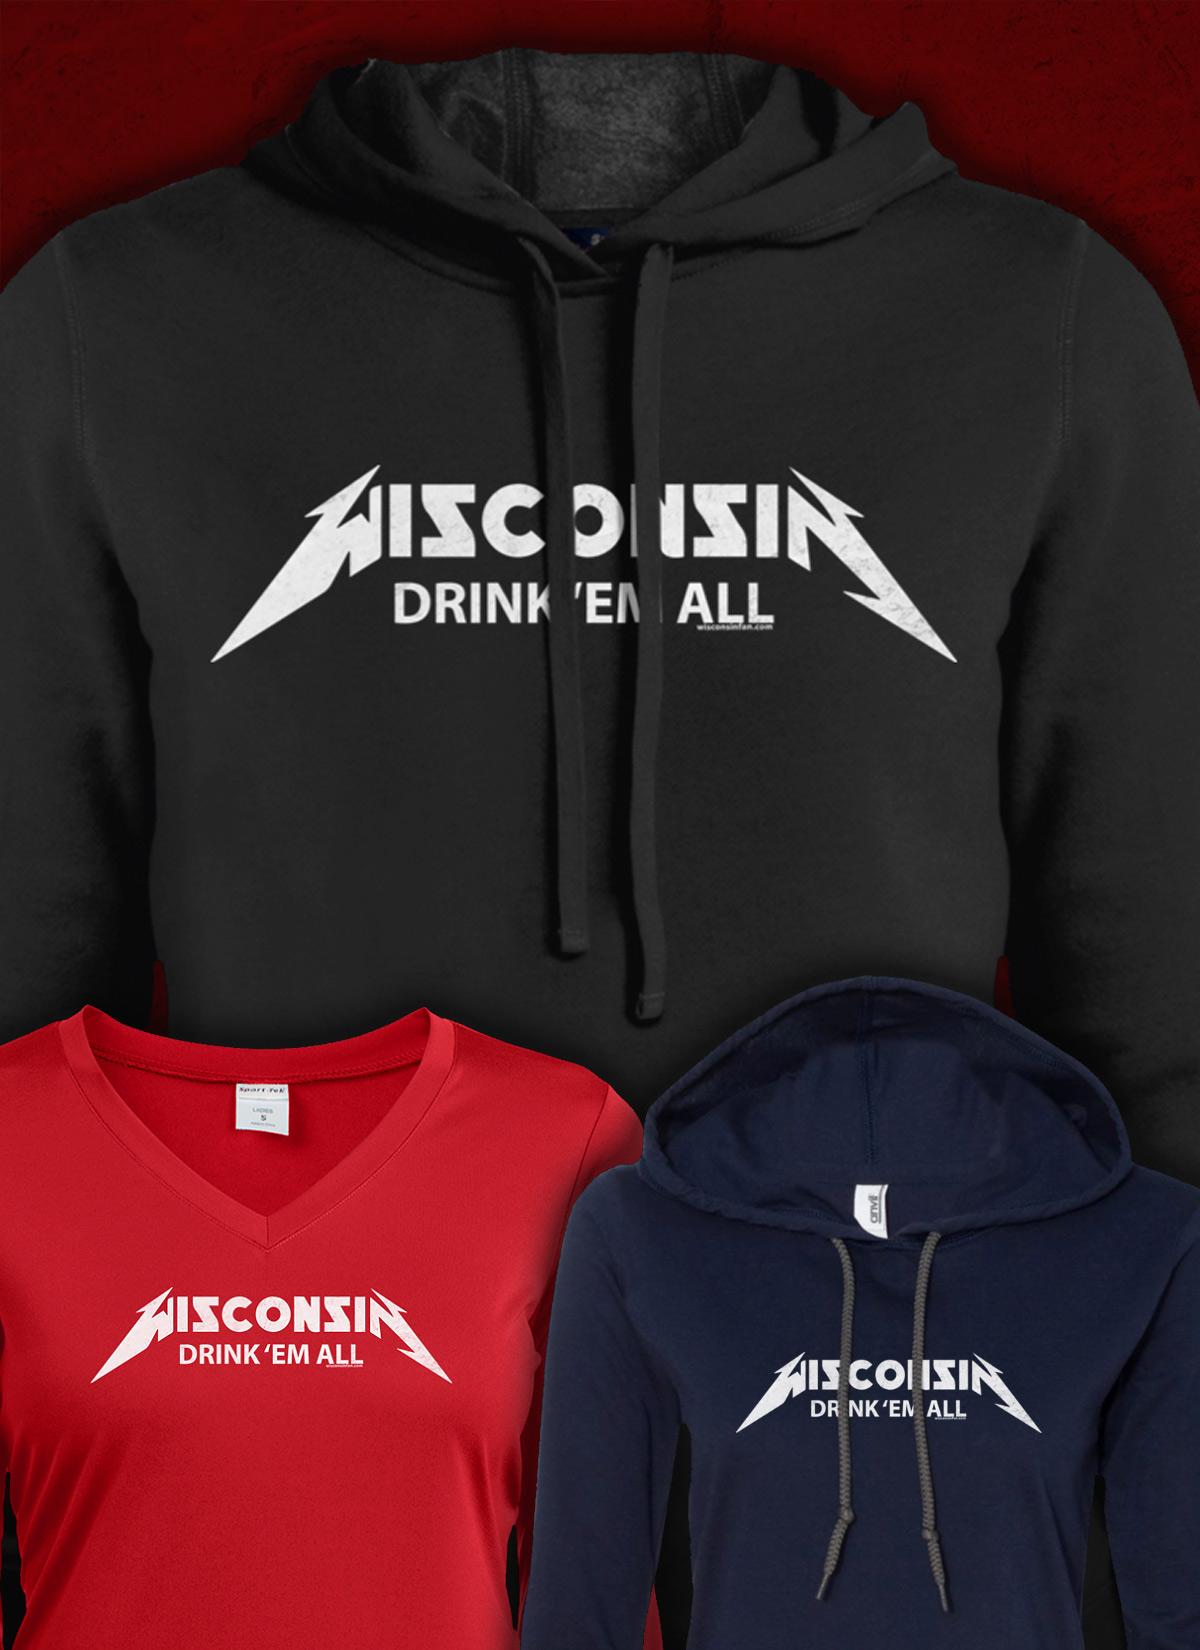 wisconsin-drink-em-all-womens-hoodie